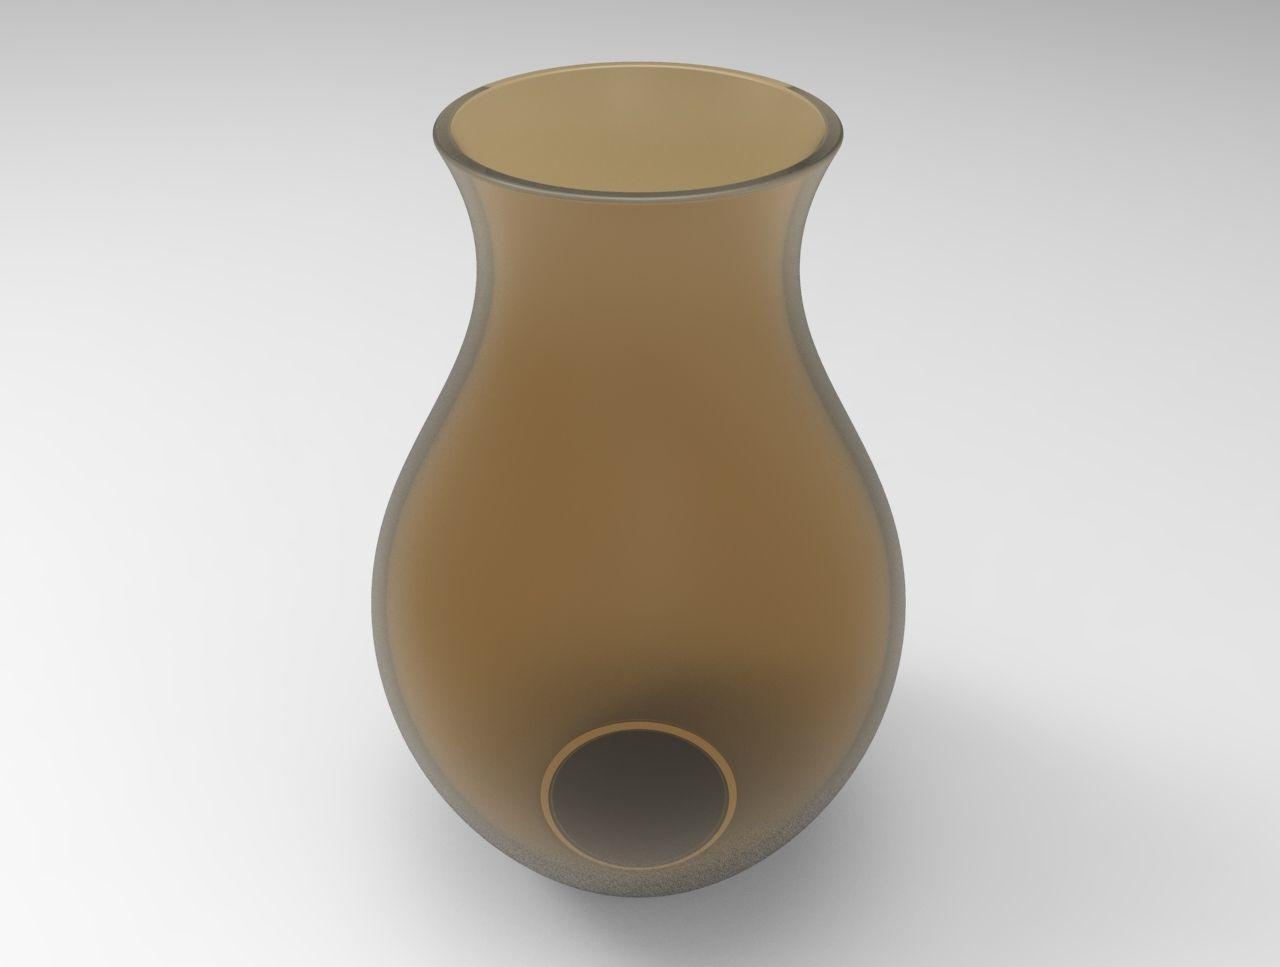 Amphora lite